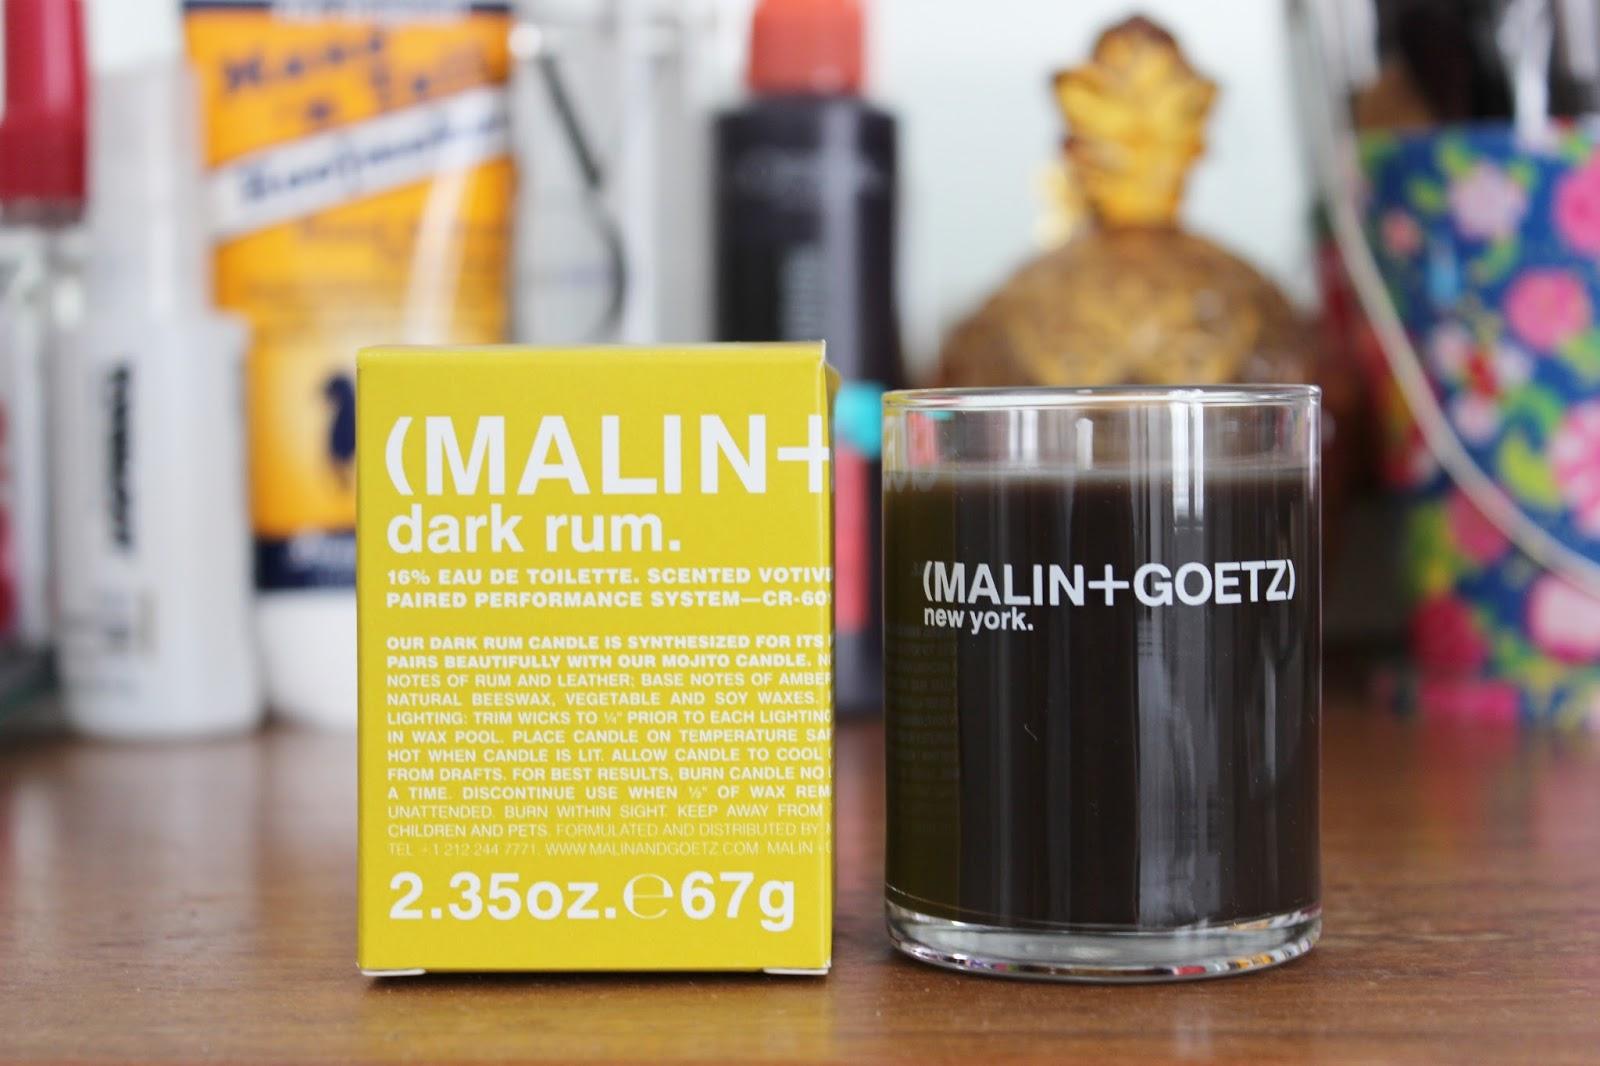 Malin + Goetz Dark Rum scented candle